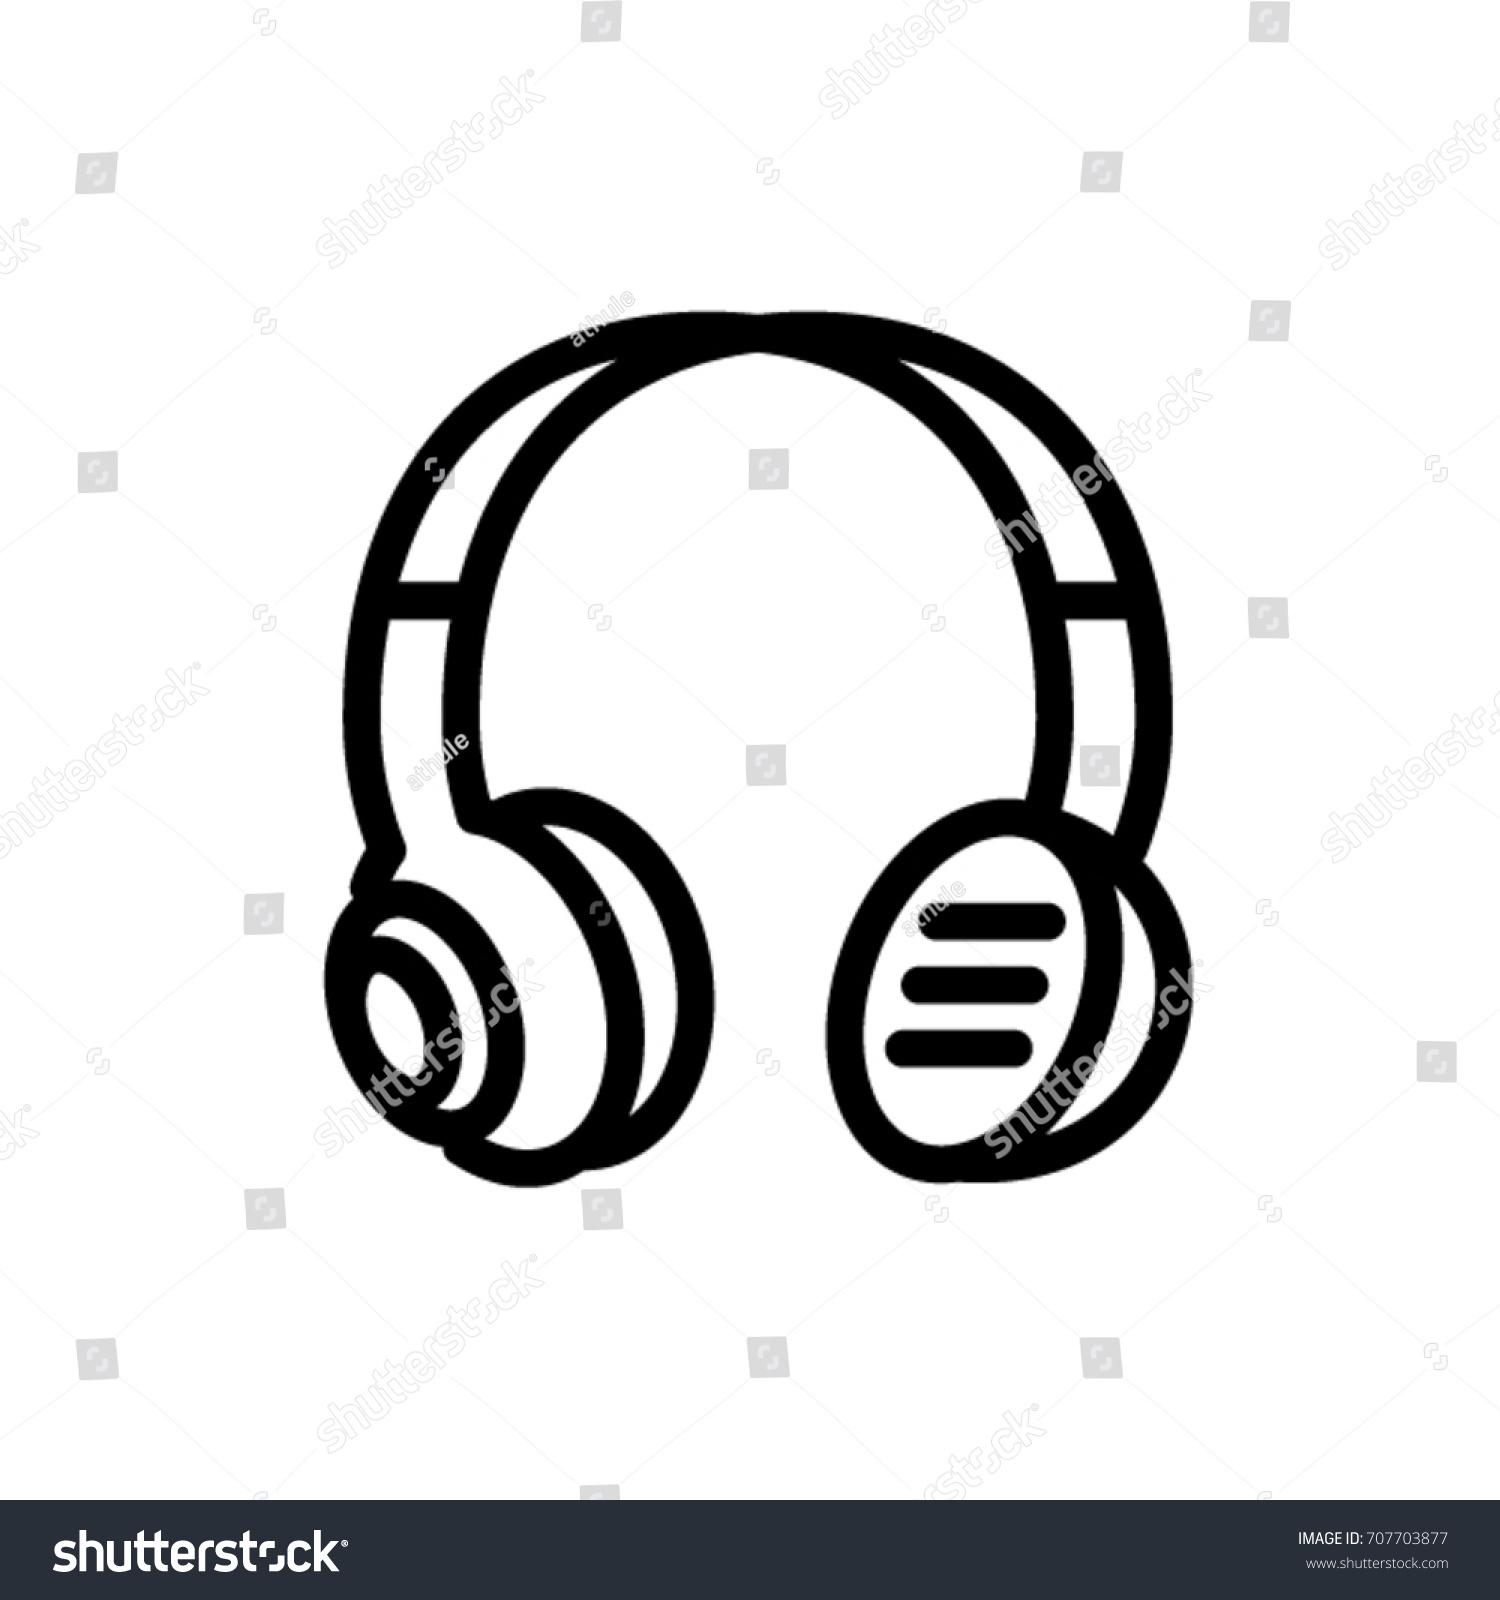 Headphones Icon Stock-Vektorgrafik 707703877 – Shutterstock